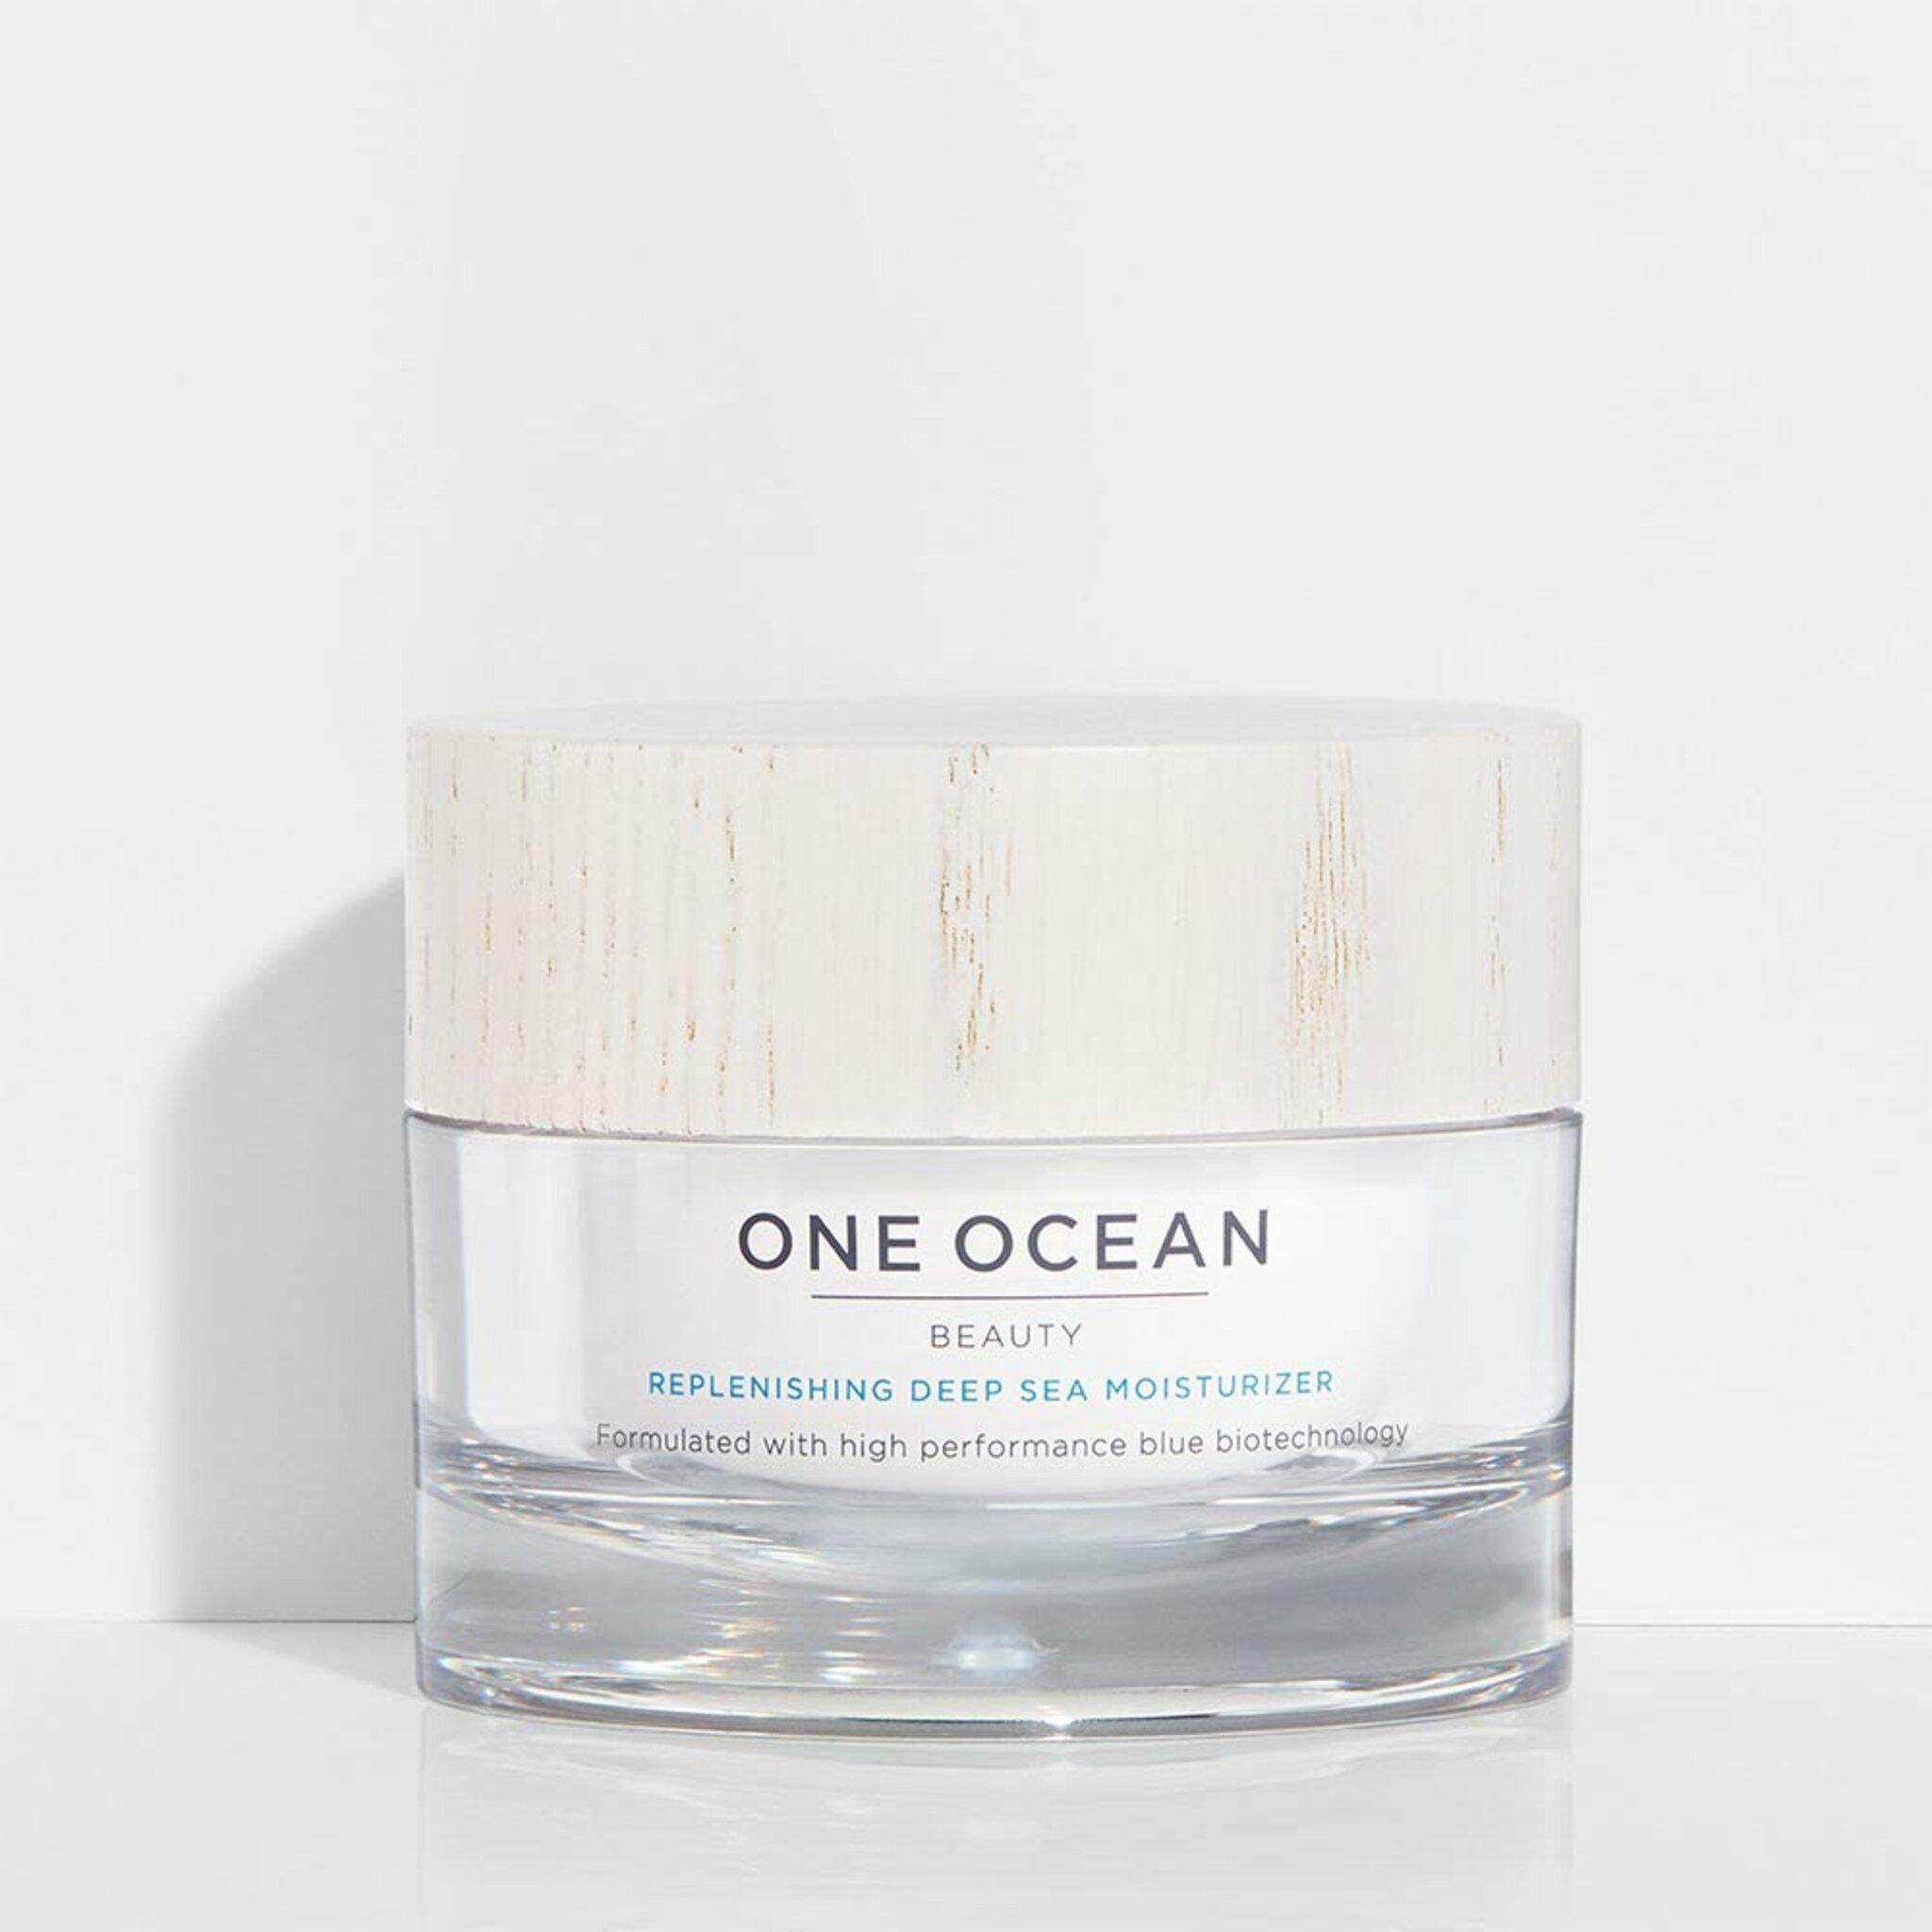 Replenishing Deep Sea Moisturizer